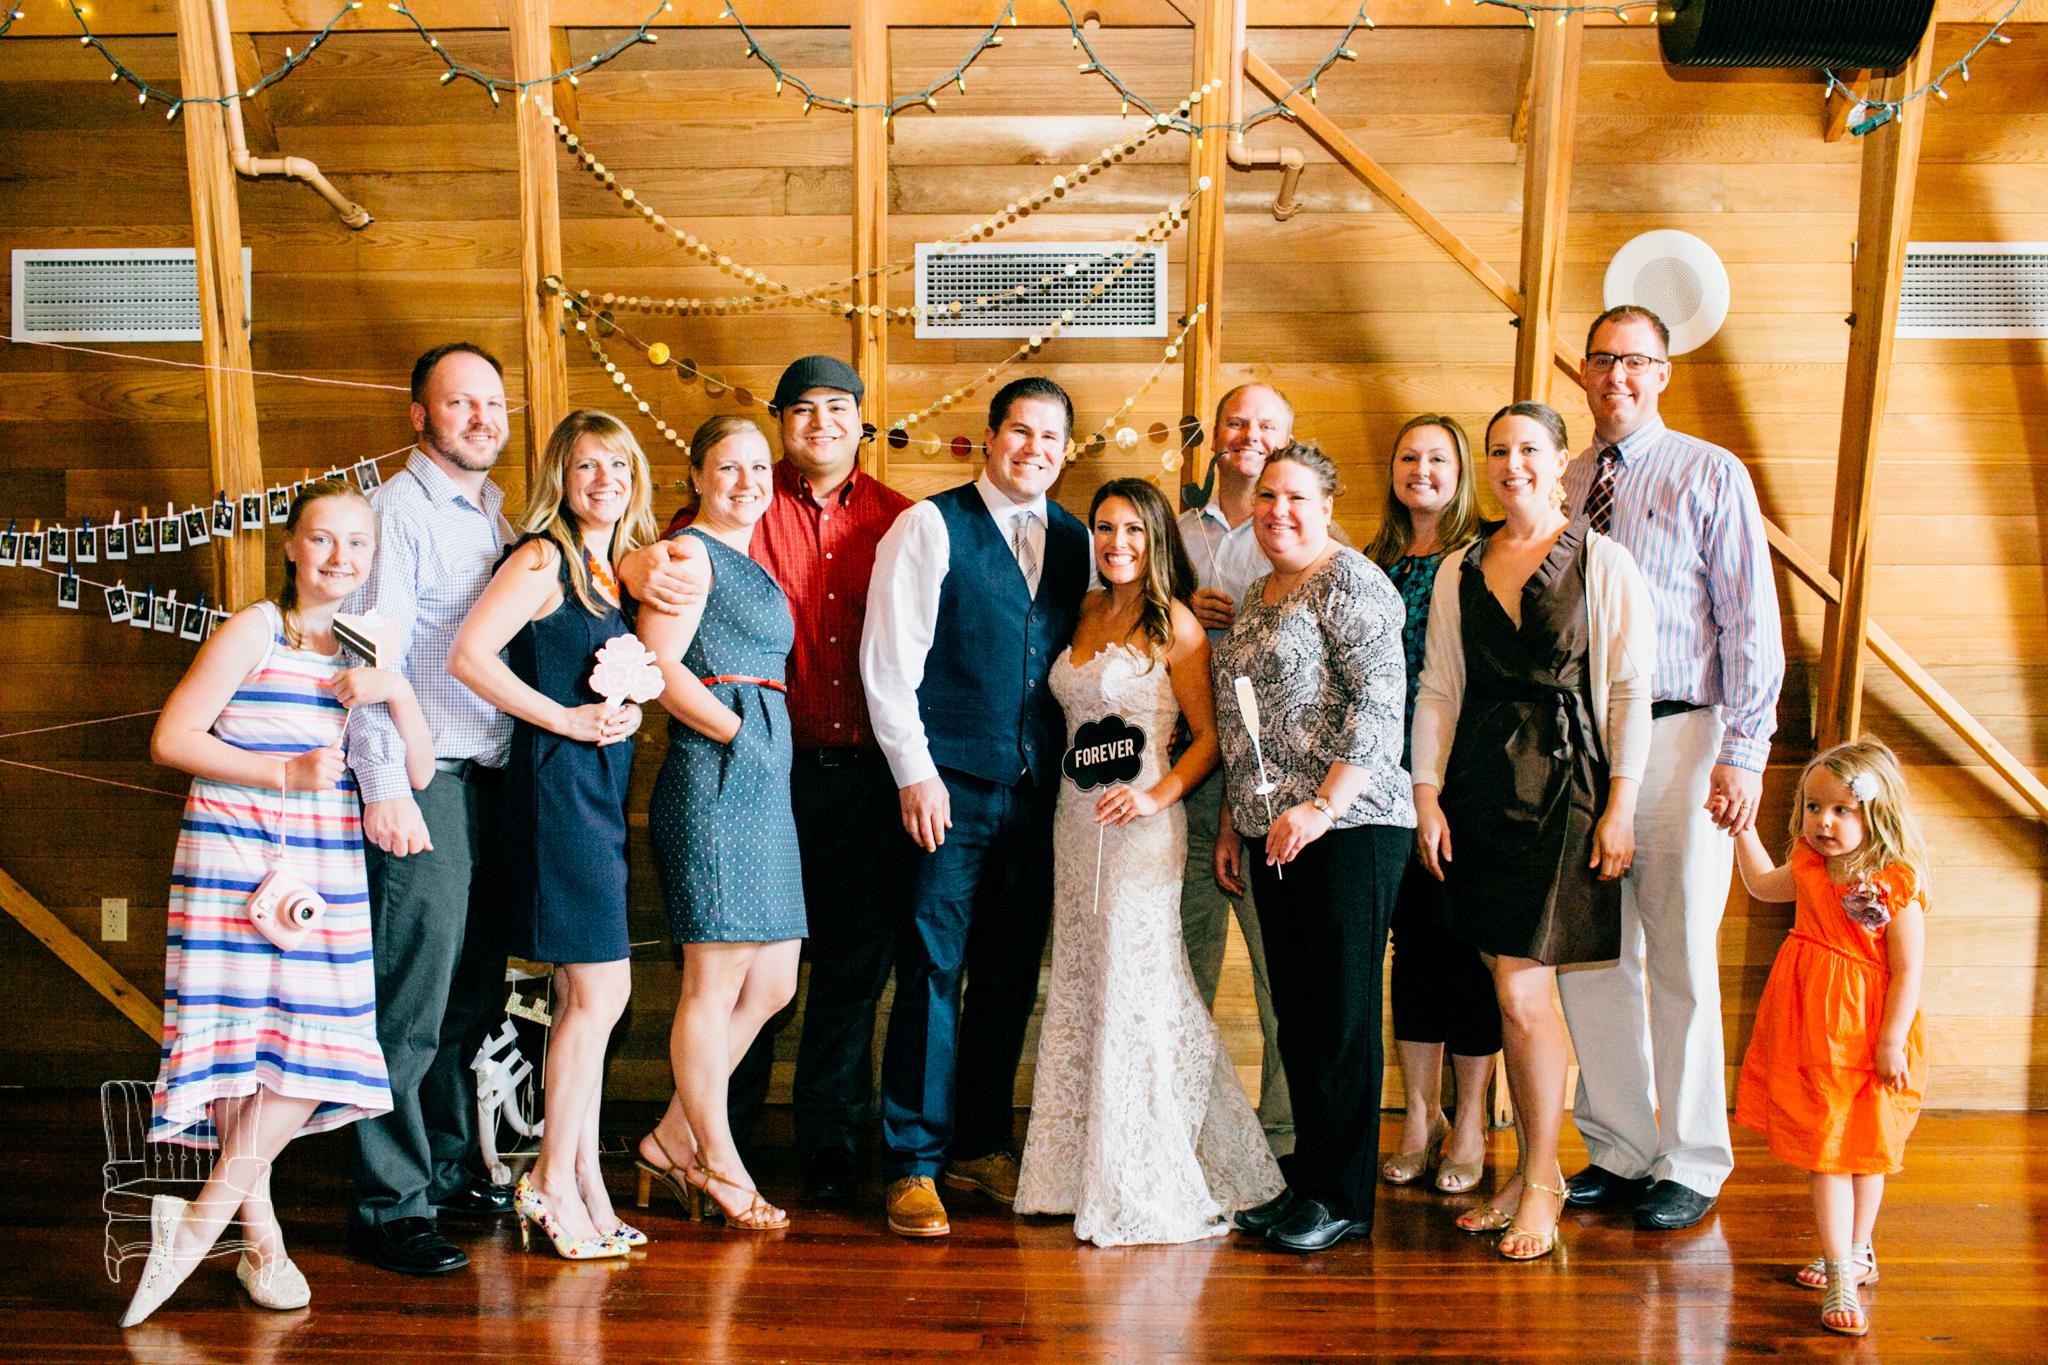 seattle-wedding-photographer-katheryn-moran-russells-bothell-wilkins-wedding-photo-57.jpg